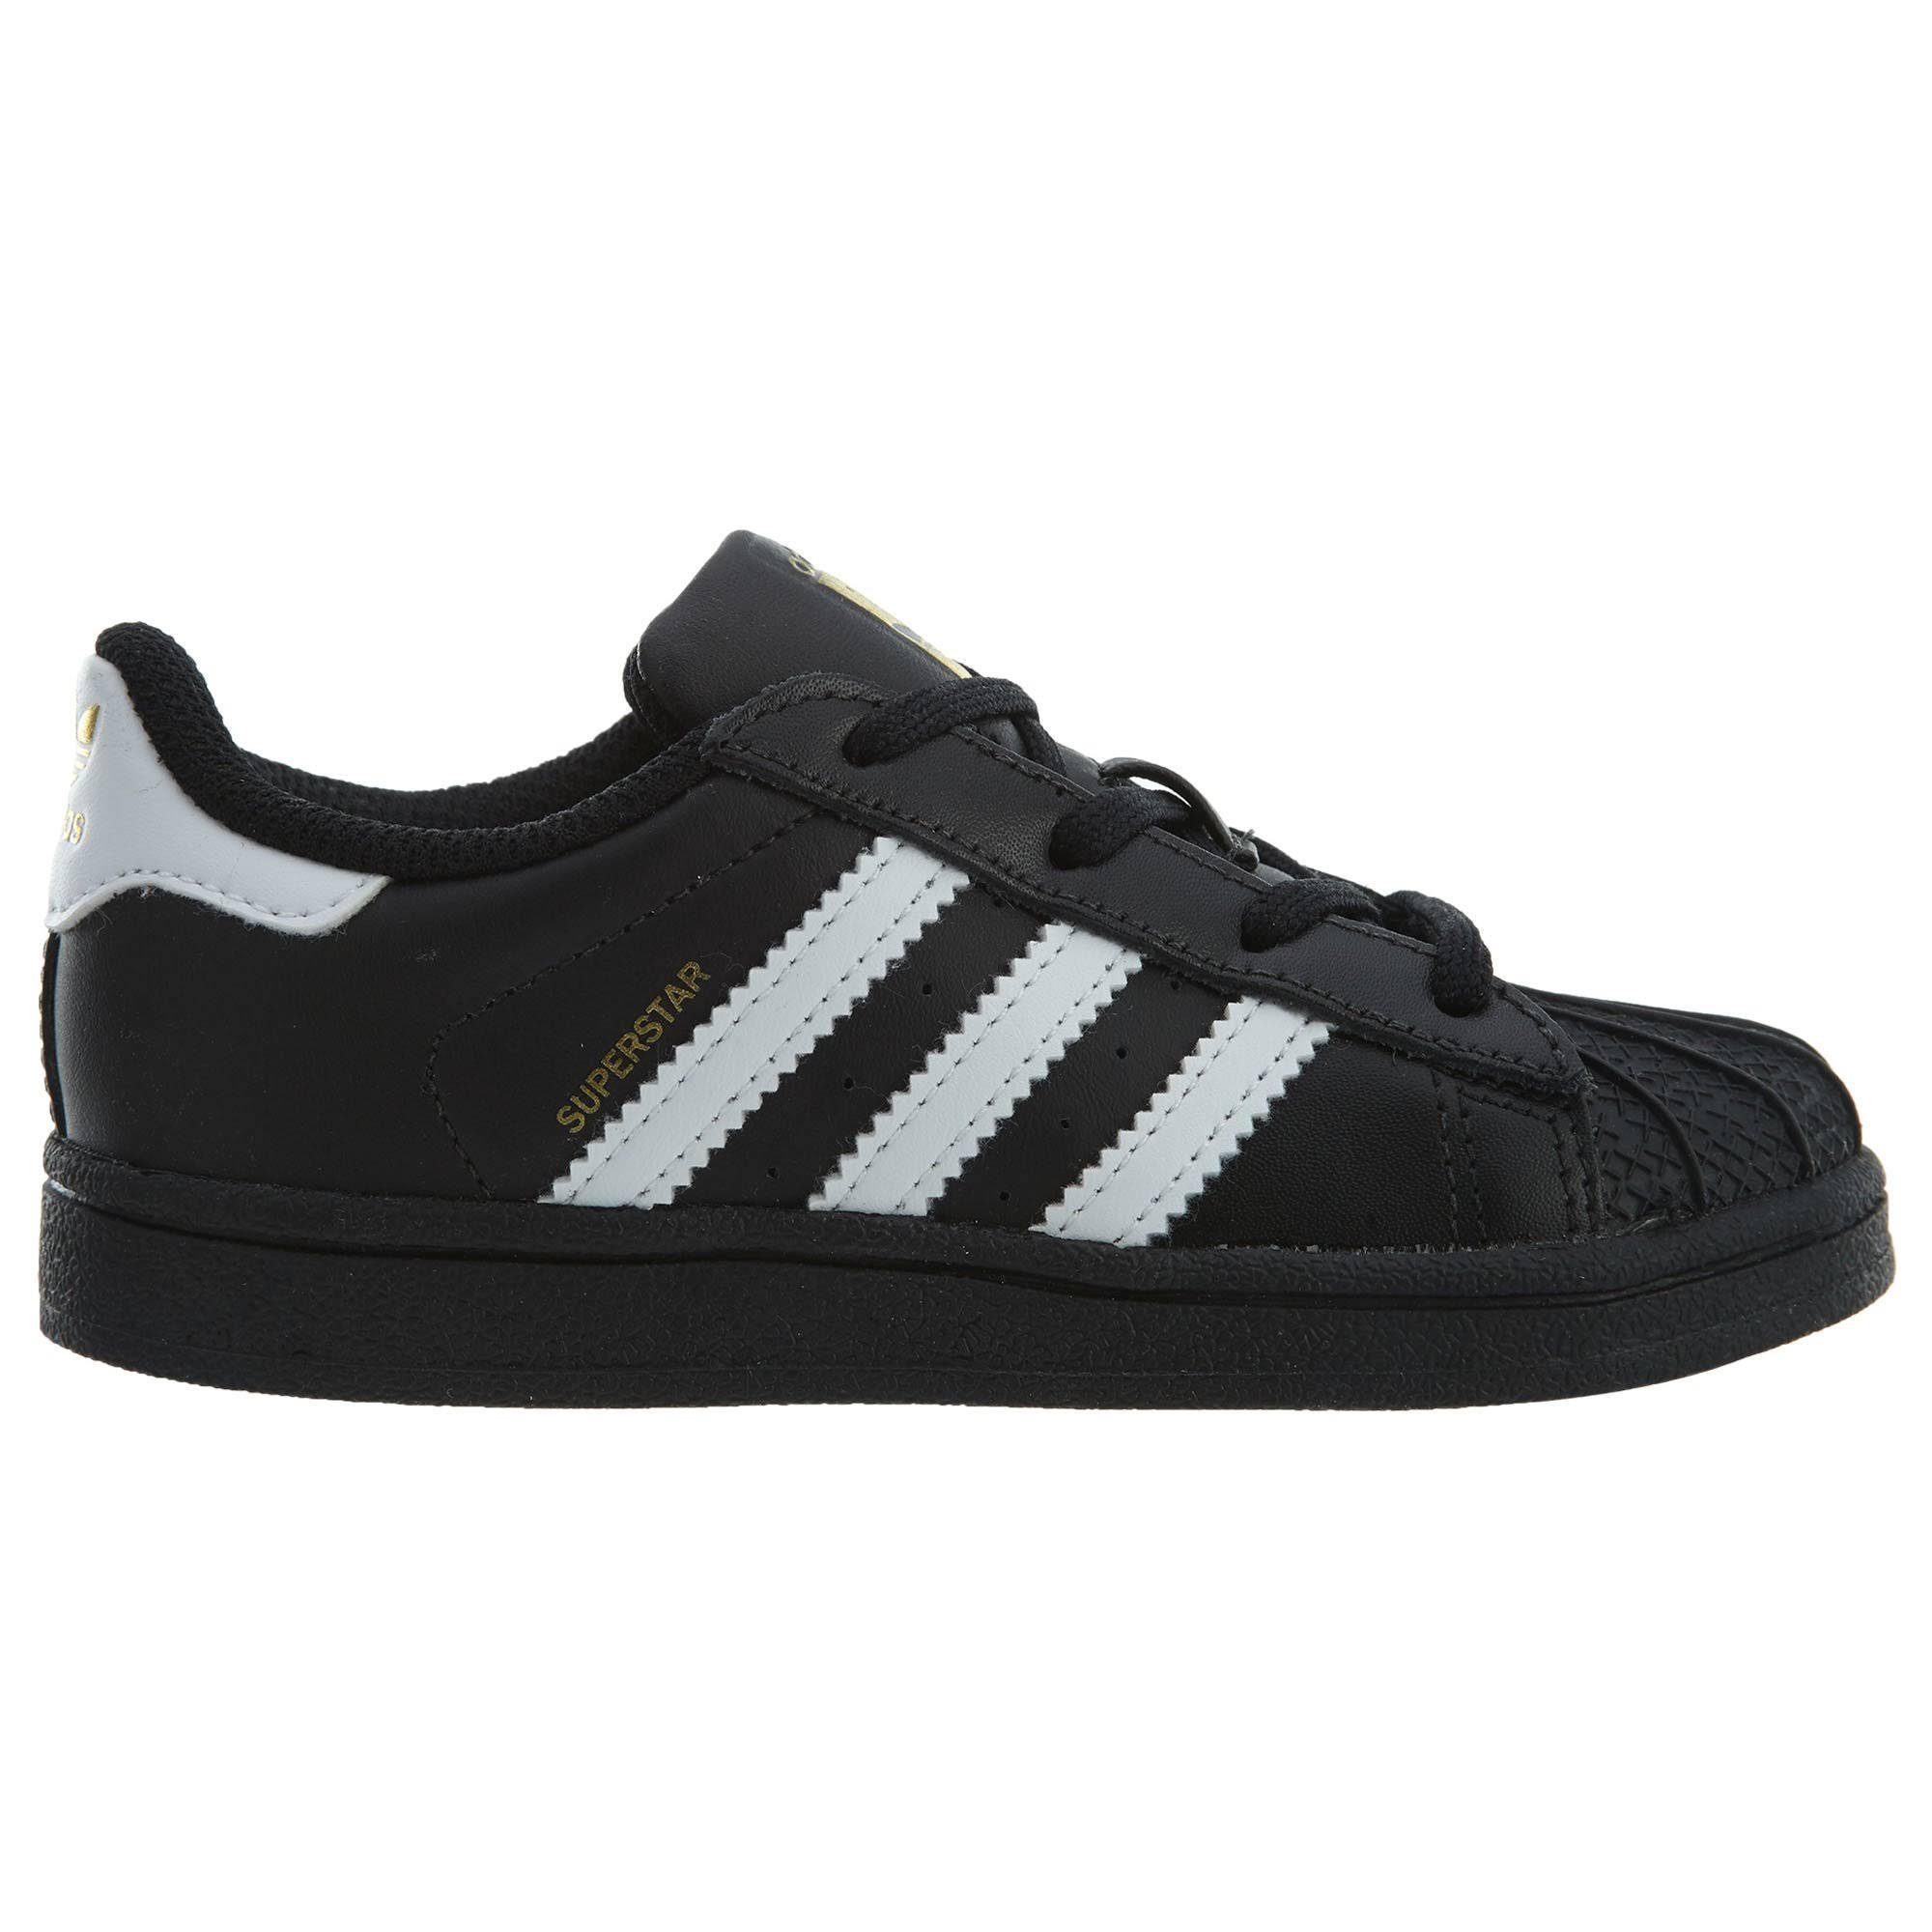 SuperstarNeroBianco bianco Toddler Scarpe Adidas Originals 2EHID9W